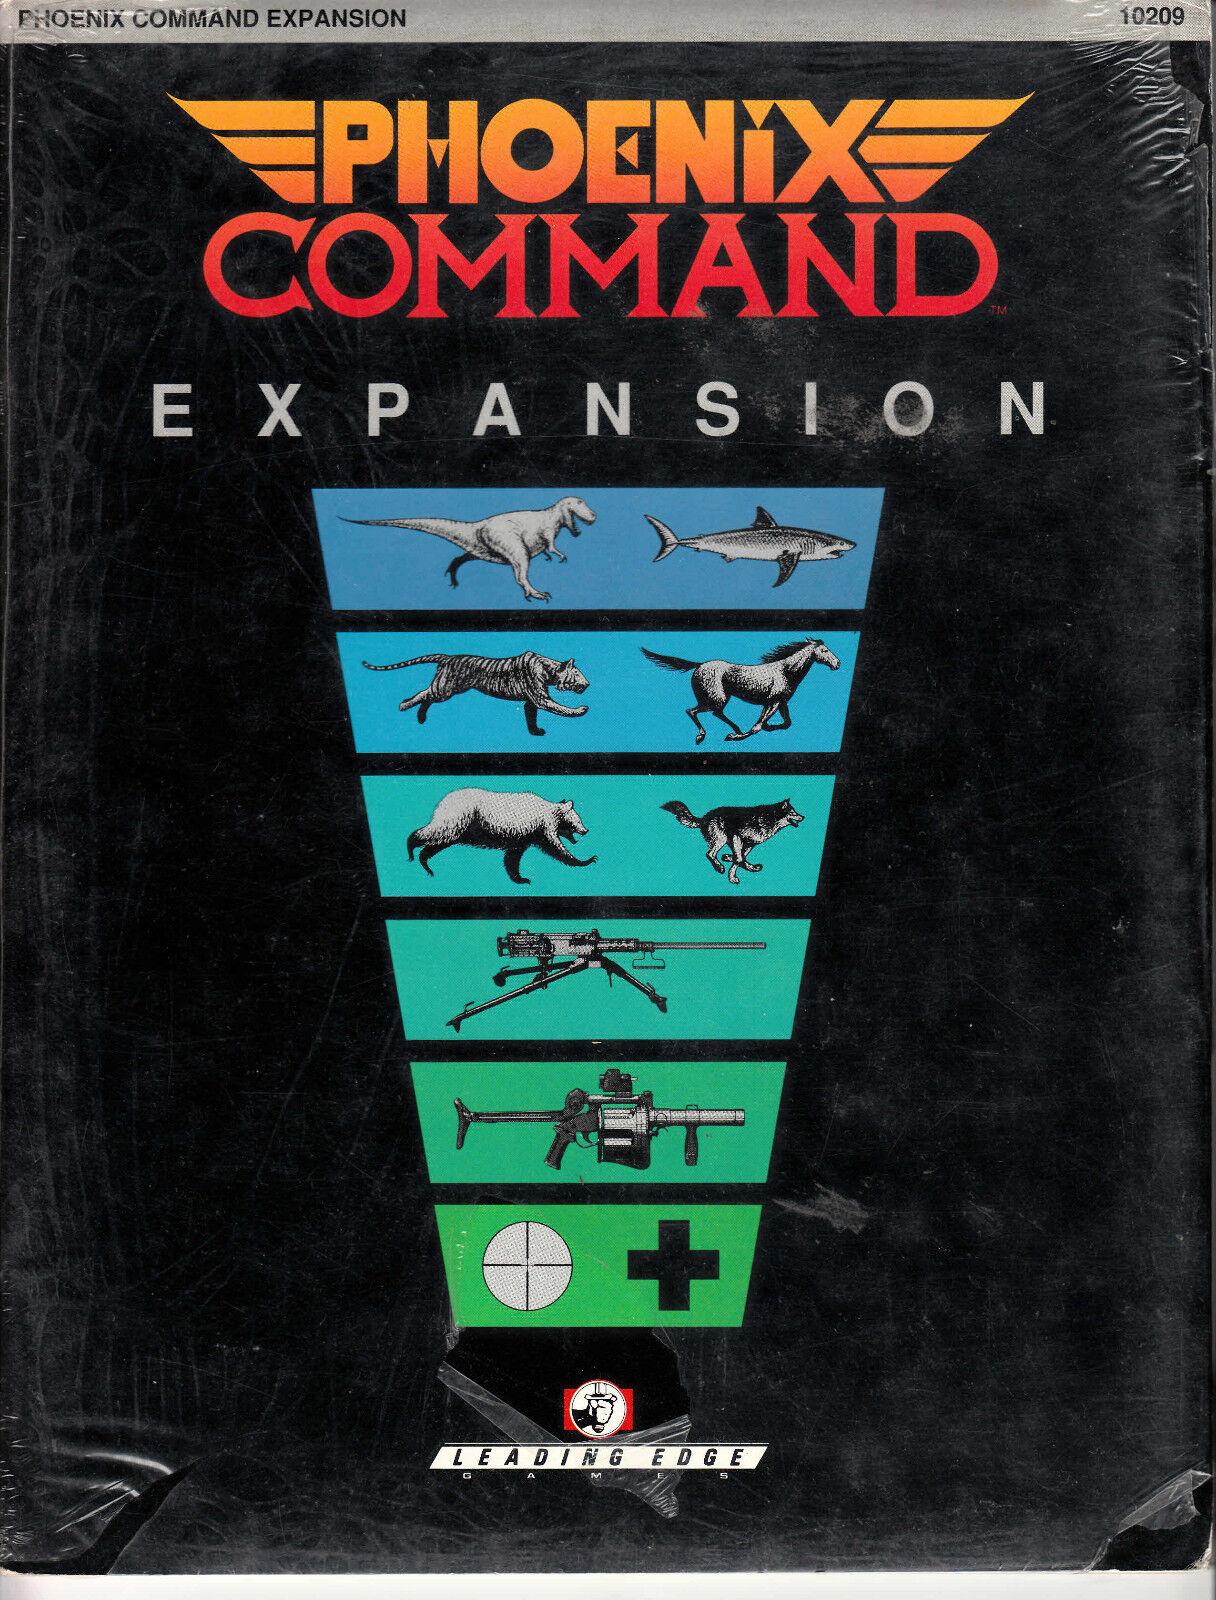 PHOENIX COMMAND EXPANSION - Leading Edge 10209